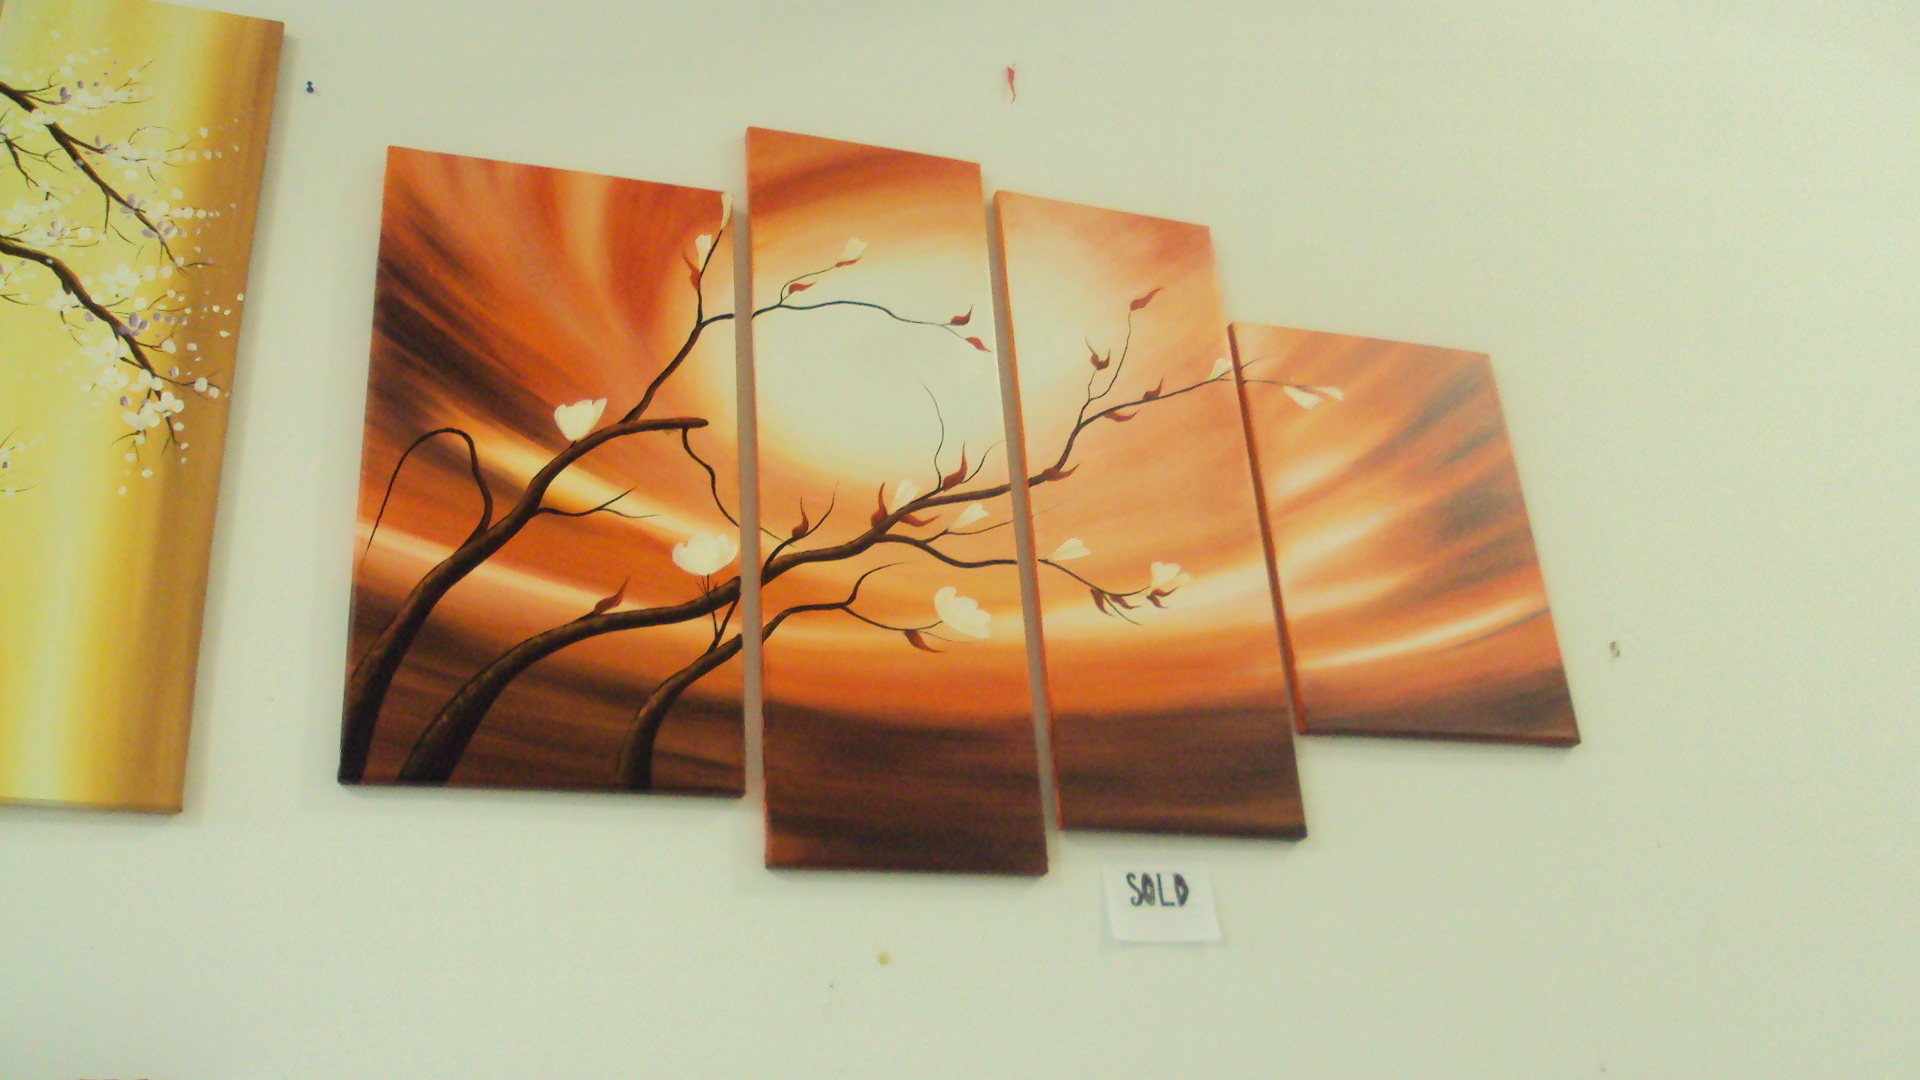 bbe0ba25cf06b92d9071_6c4fd59178173575df24bad141b8a54fquad-painting--2-.jpg